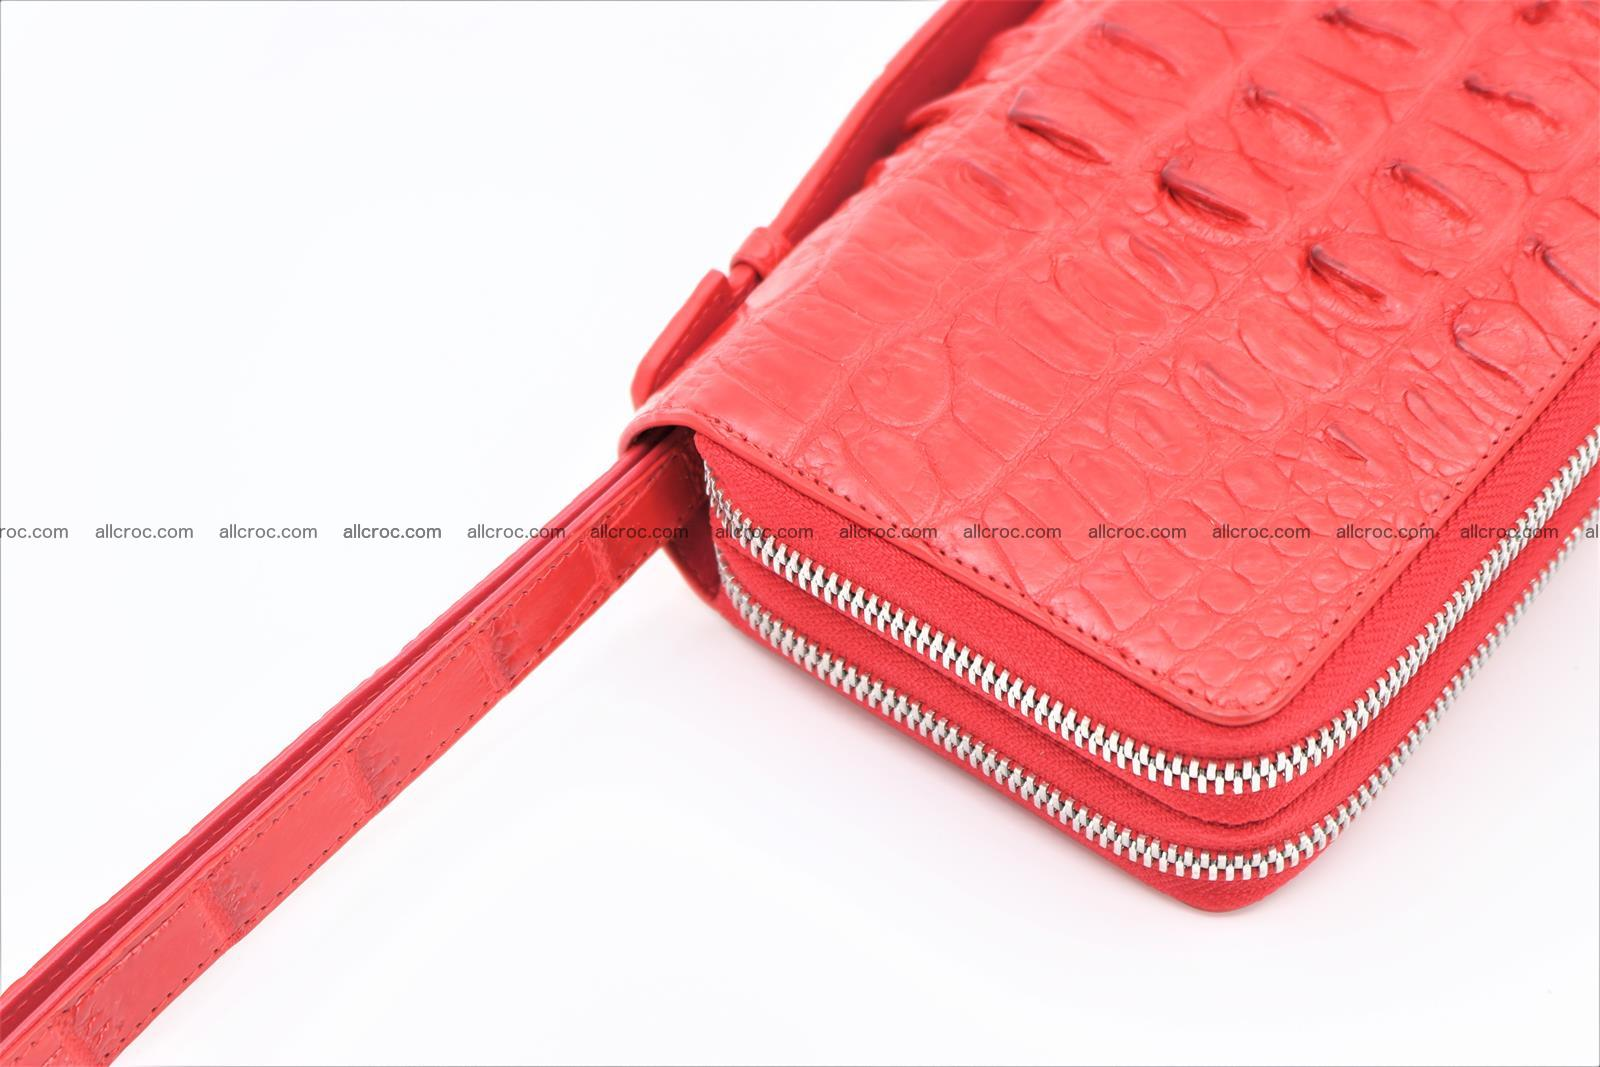 Crocodile skin clutch red color 2 zips 1263 Foto 6